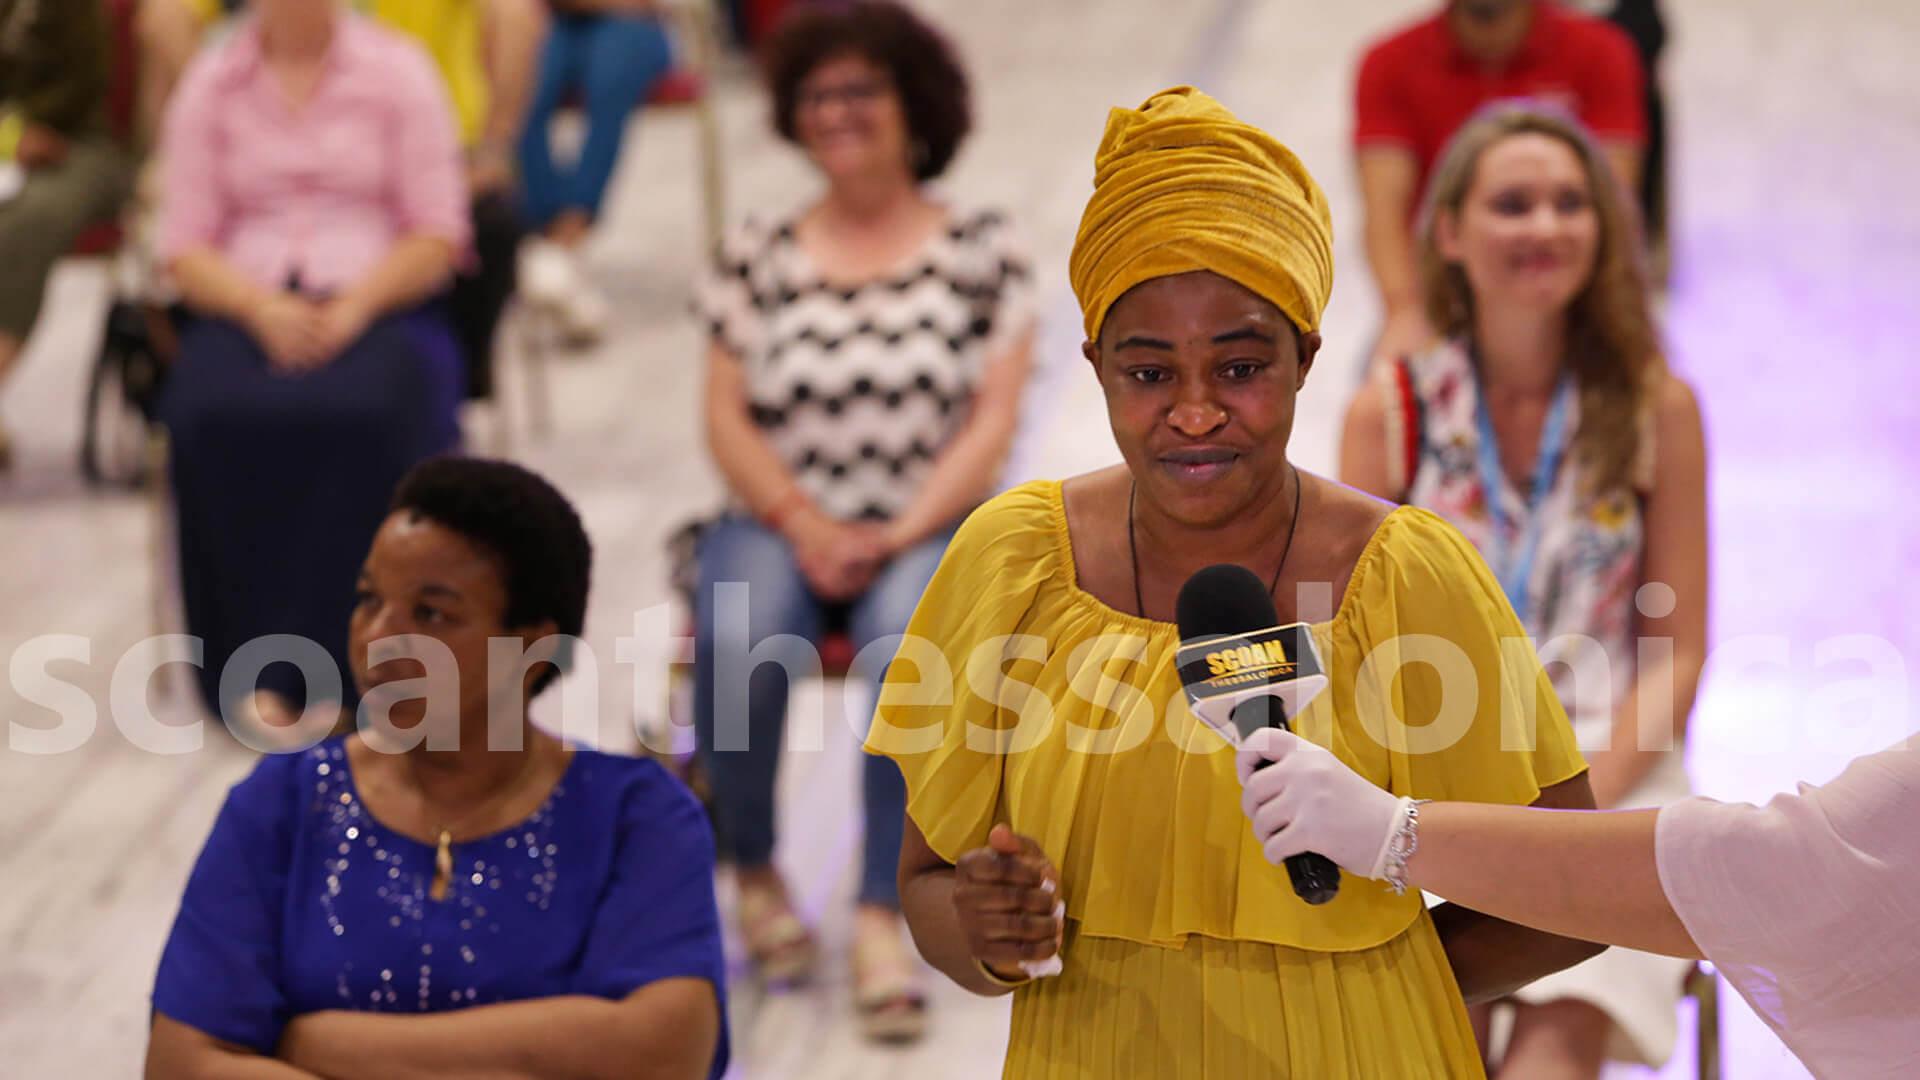 TESTIMONY_Vivian Onyeje_2020_06_28